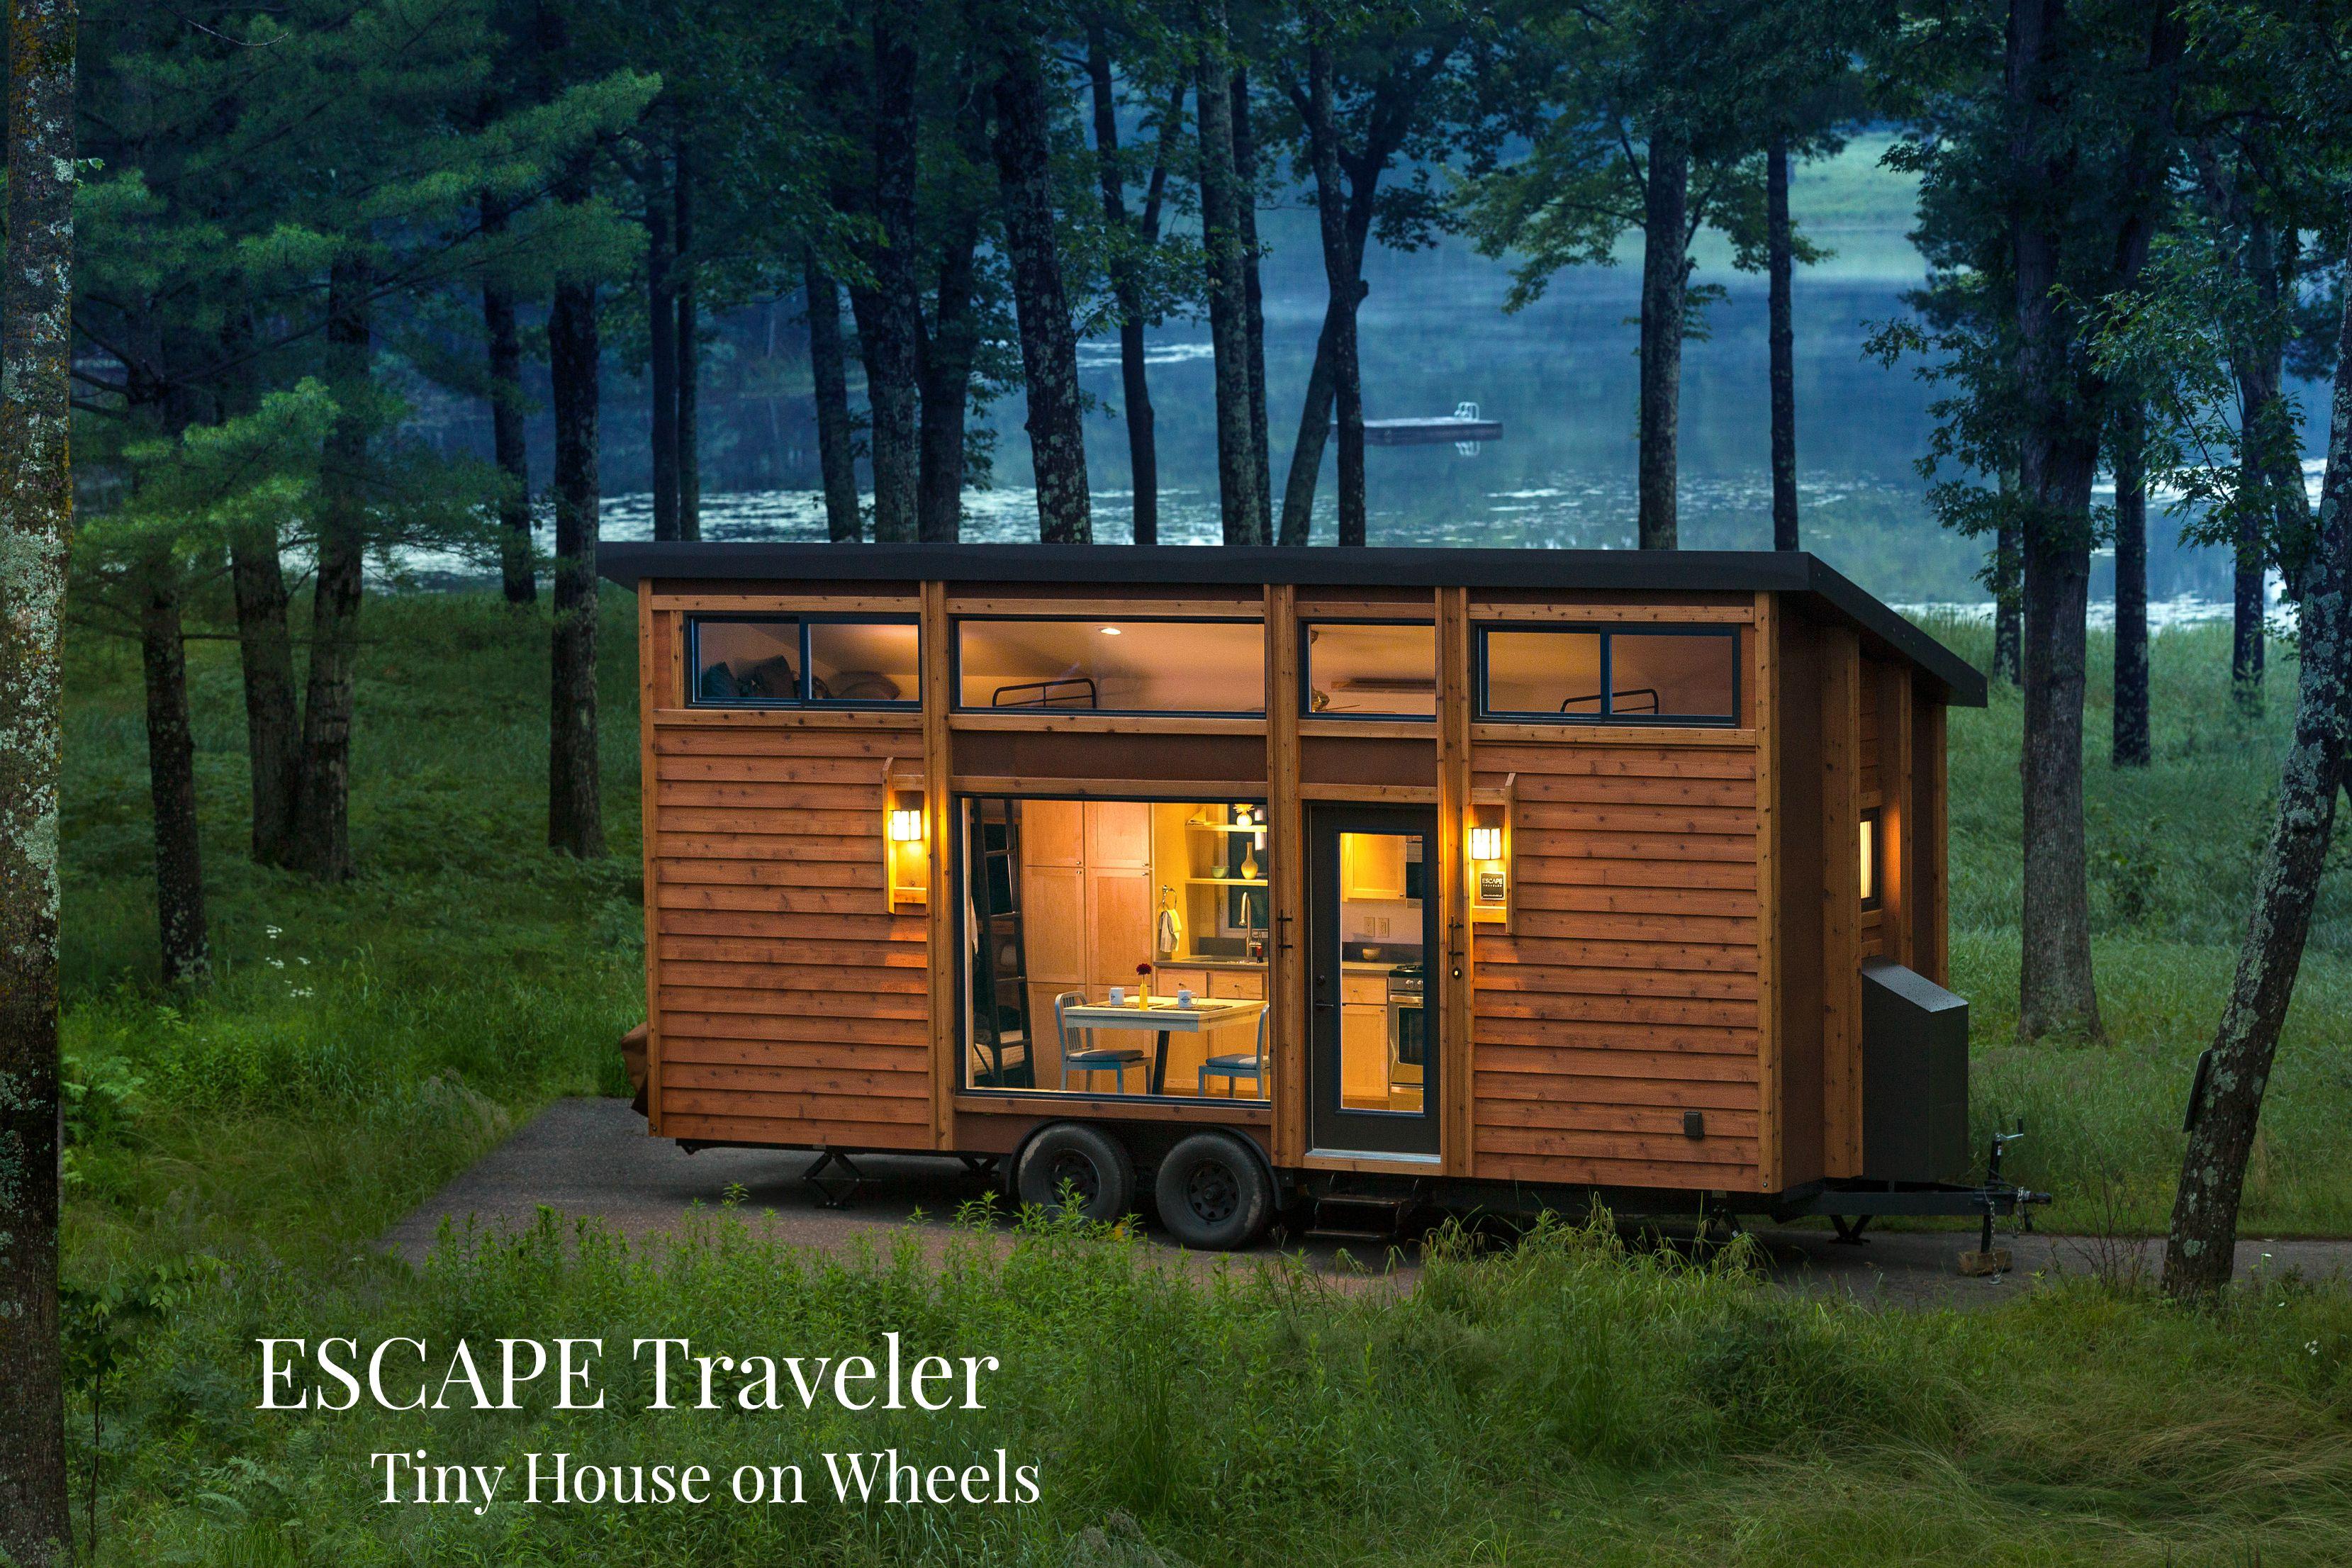 Pleasant Escape Traveler Tiny House On Wheels Largest Home Design Picture Inspirations Pitcheantrous